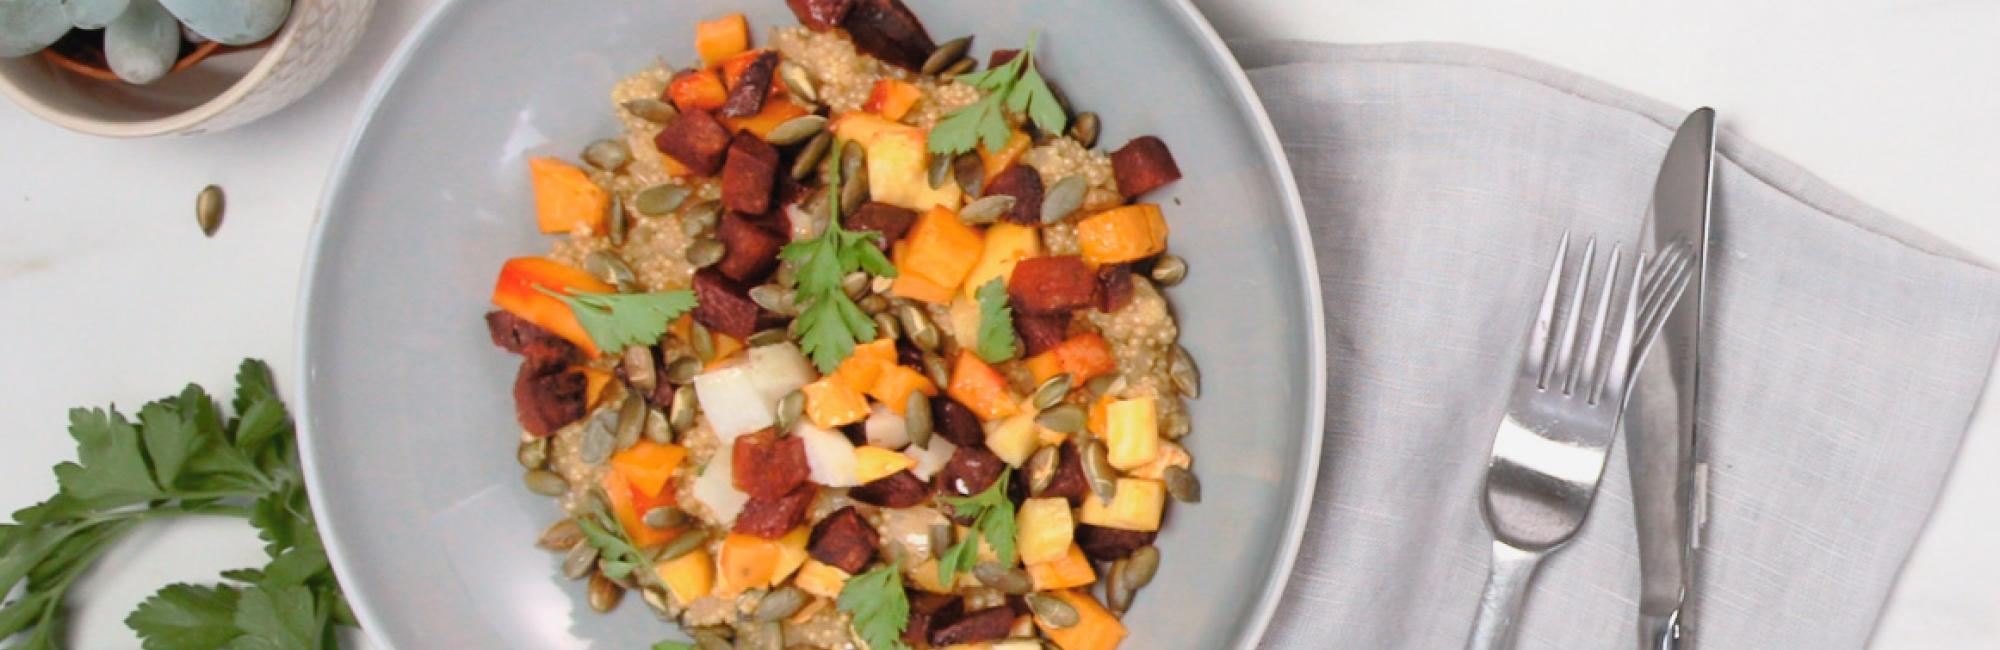 Quinoa, wintergroentjes, rode bieten, pompoen, rapen